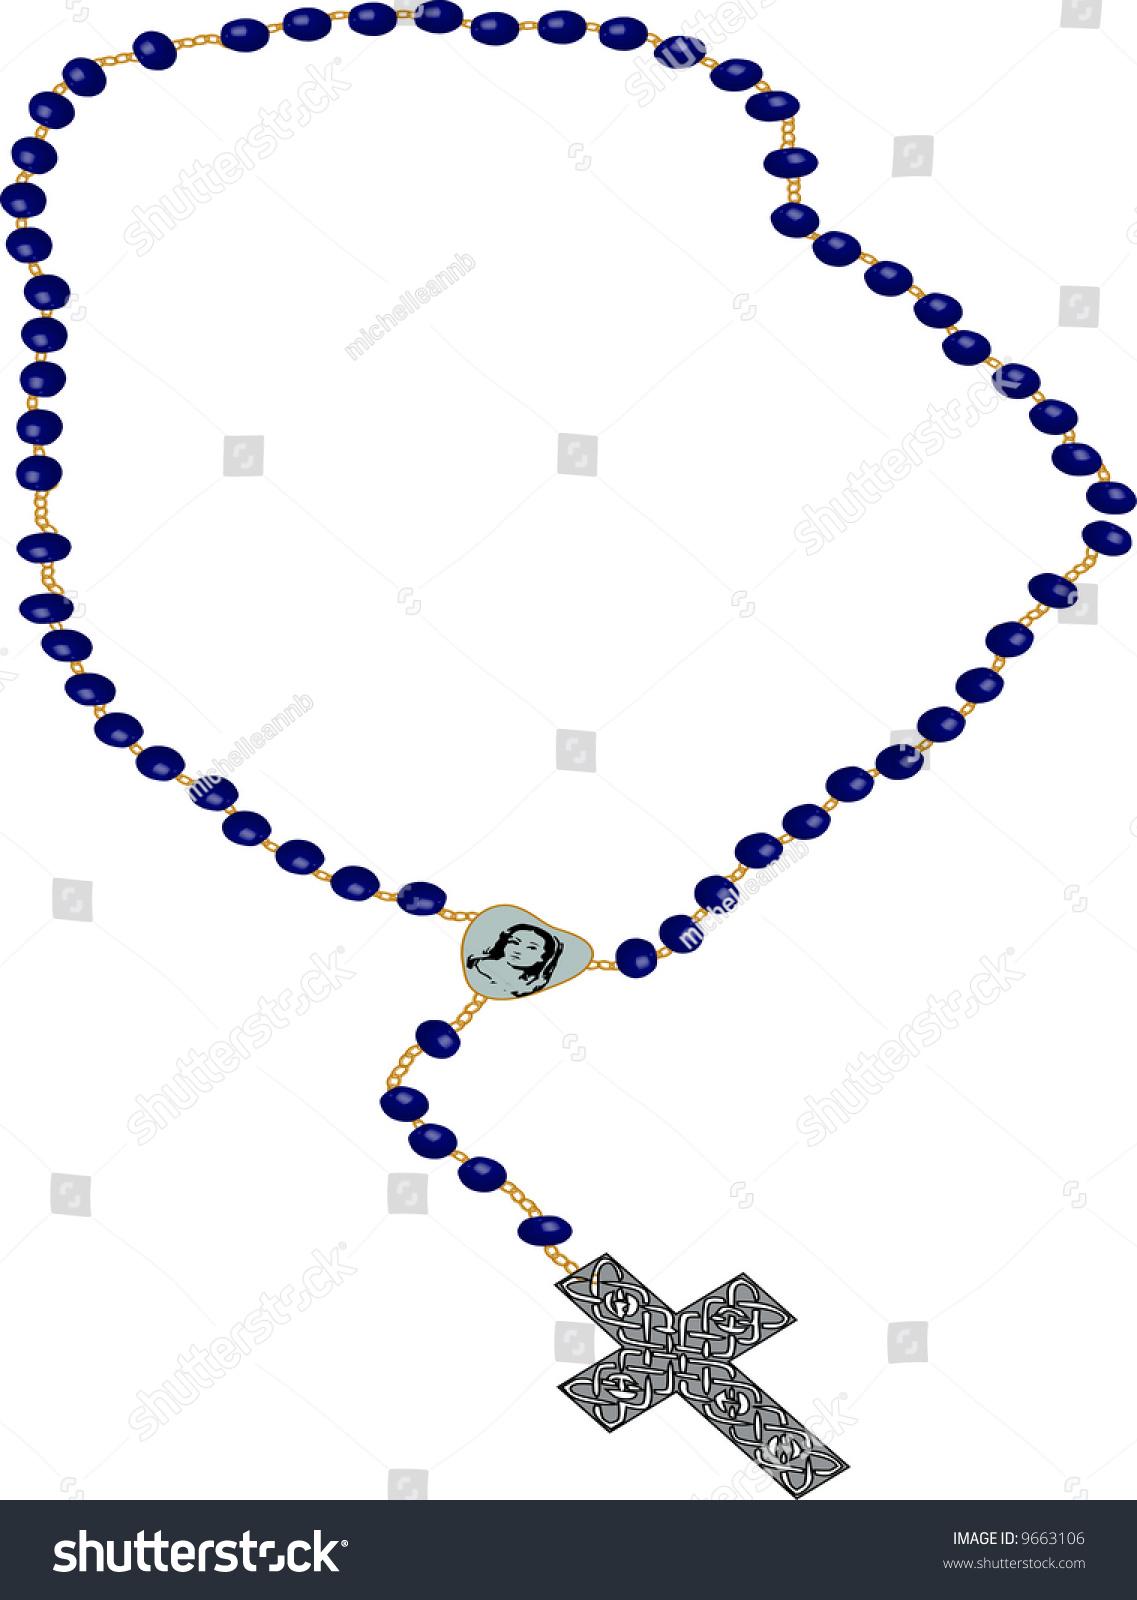 rosary clipart illustration on white background stock illustration rh shutterstock com rosary clipart free download rosary clipart png